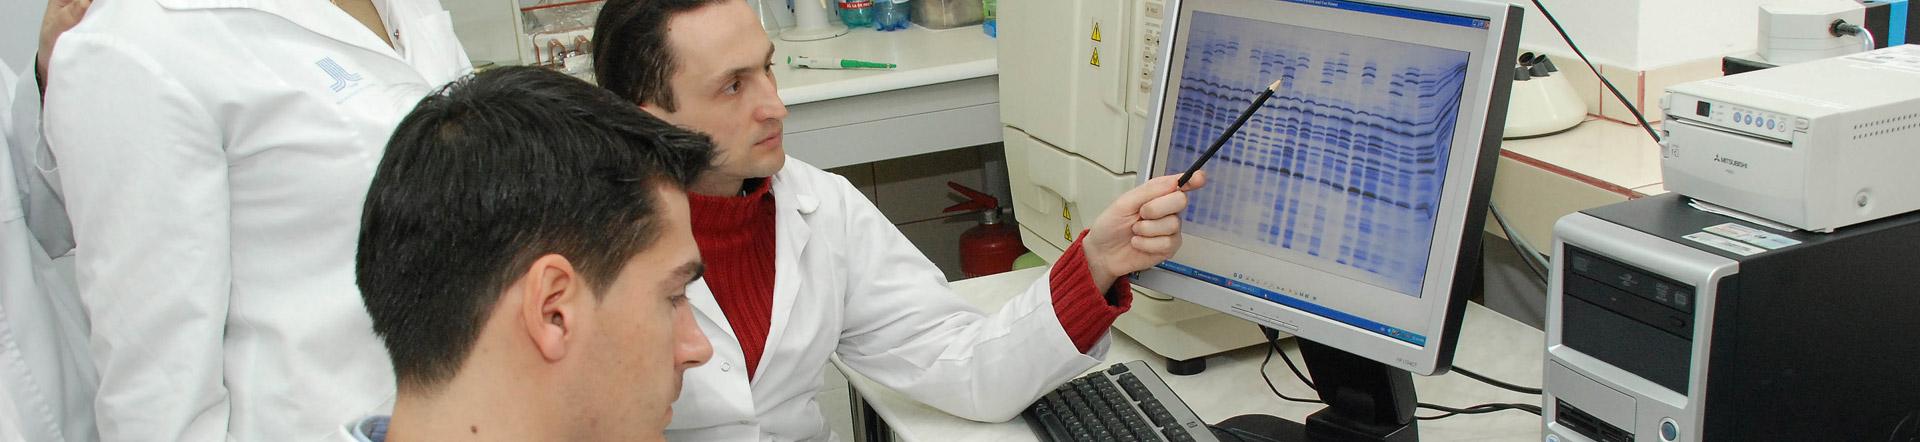 cercetare zootehnie si biotegnologii ussamv cluj